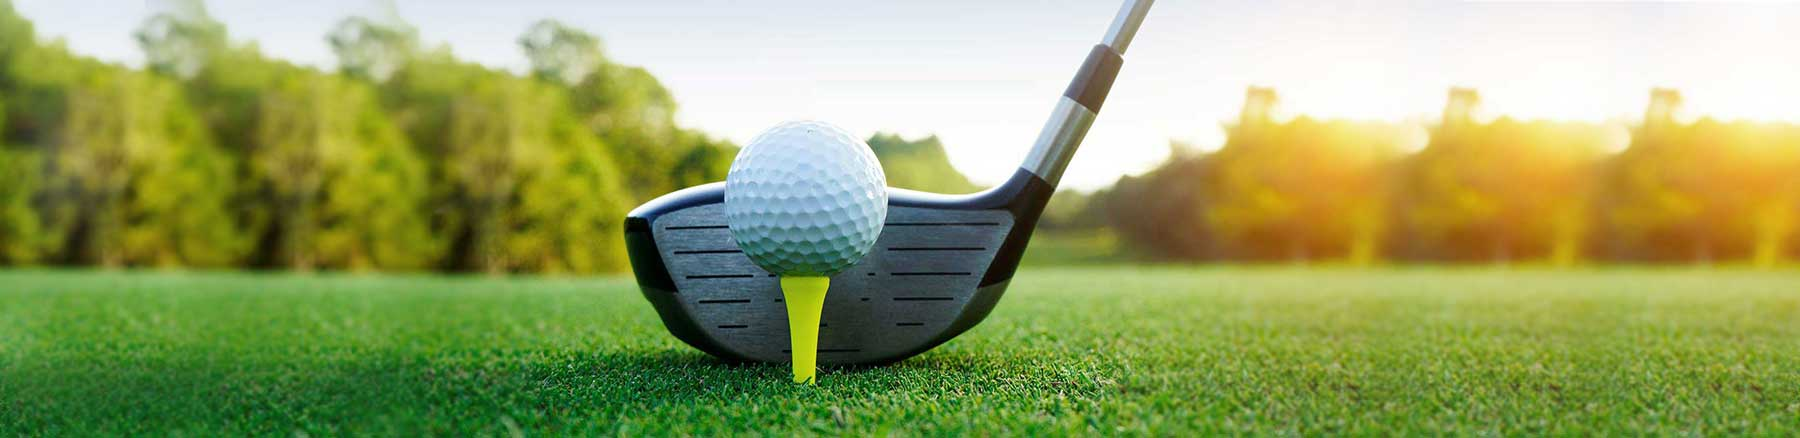 Whitney golf tournament